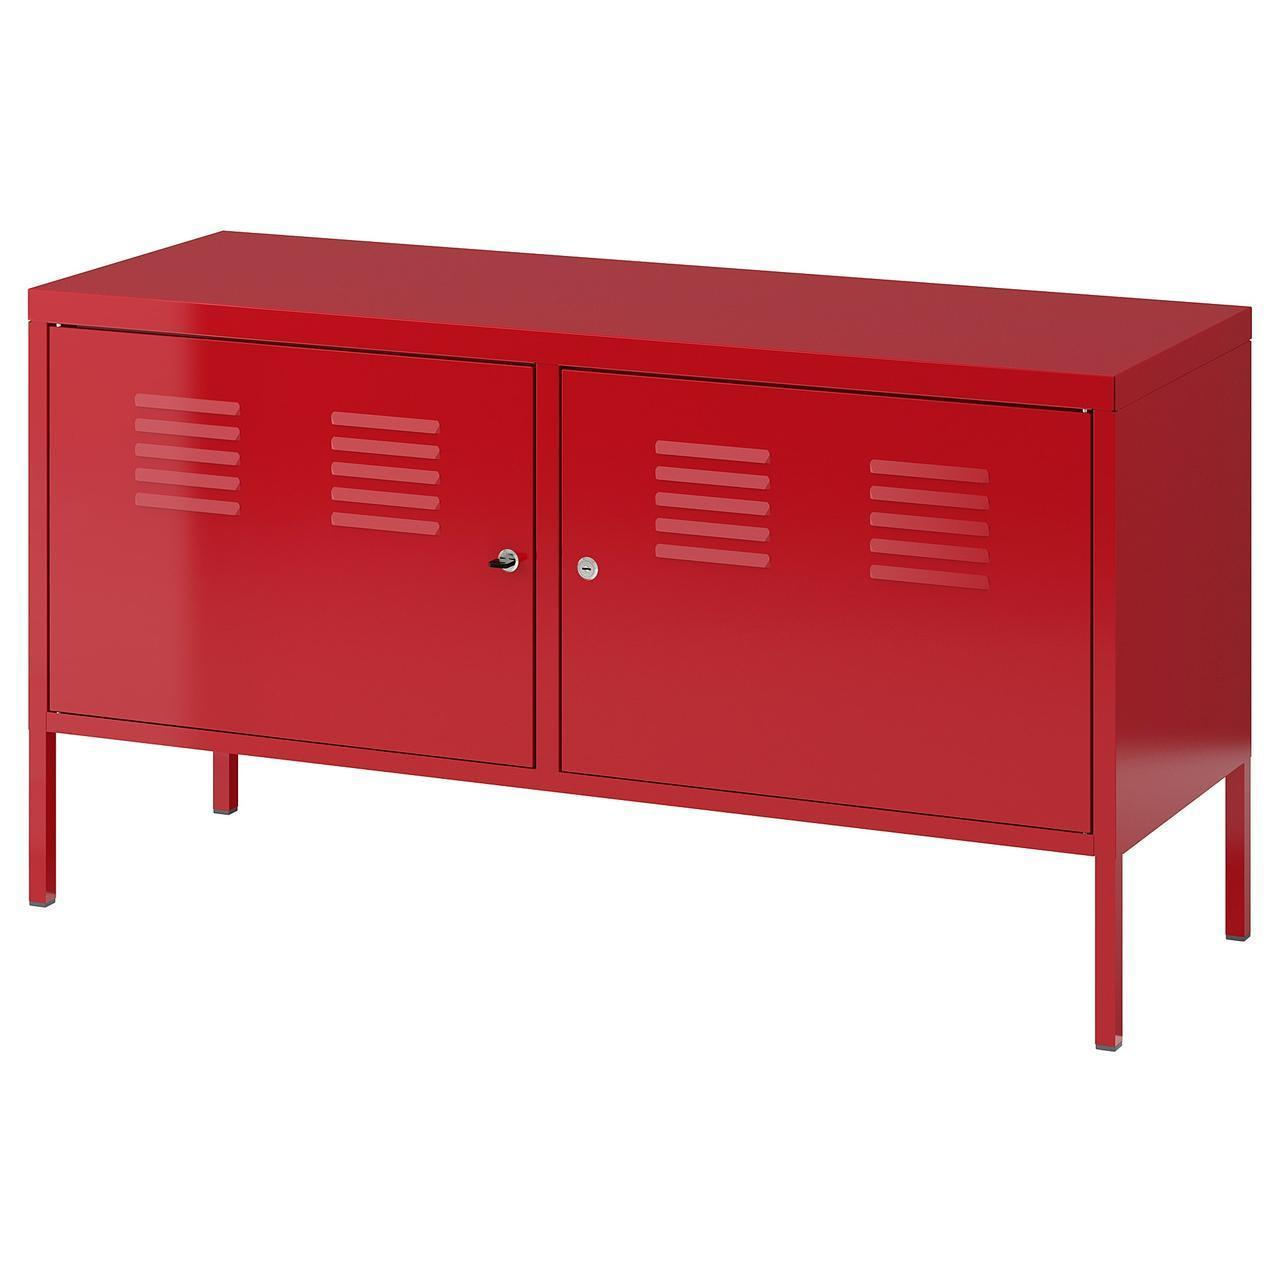 IKEA IKEAPS Шафа, червоний (801.001.90)